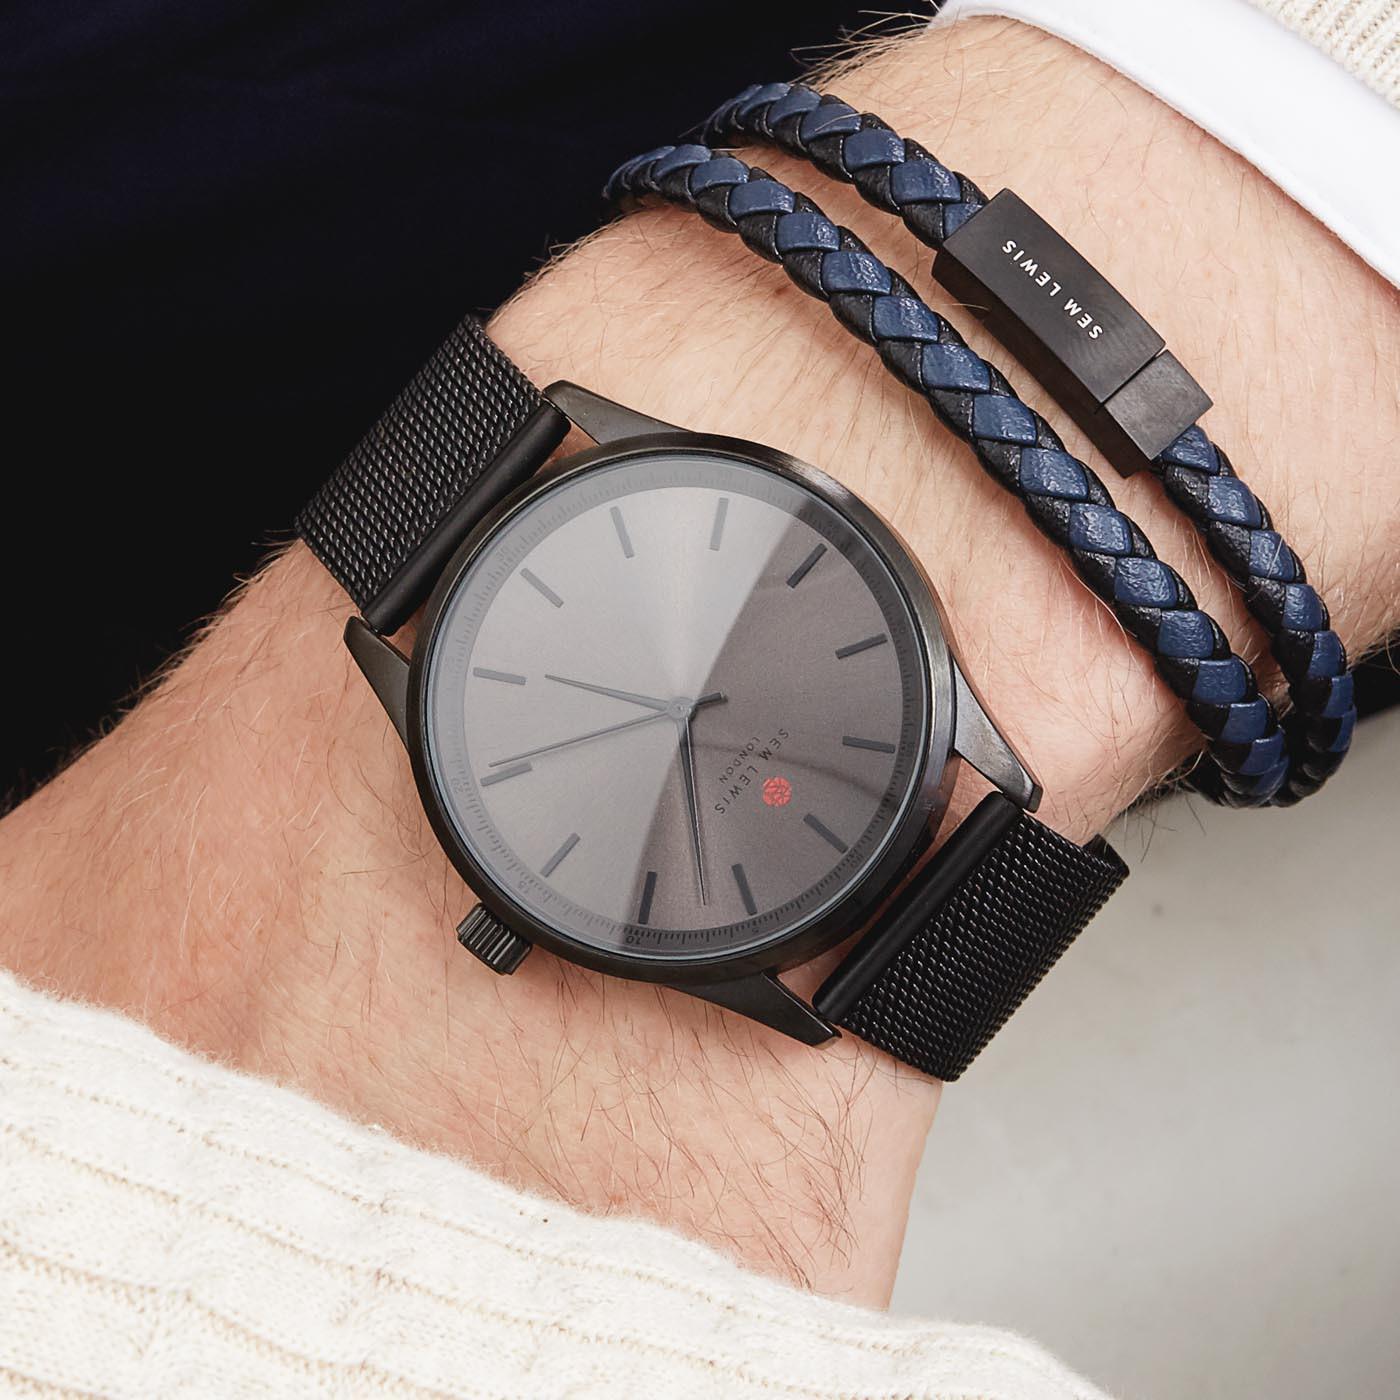 Sem Lewis Bakerloo Charing Cross Armband SL210008 (Lengte: 40.00-42.00 cm)